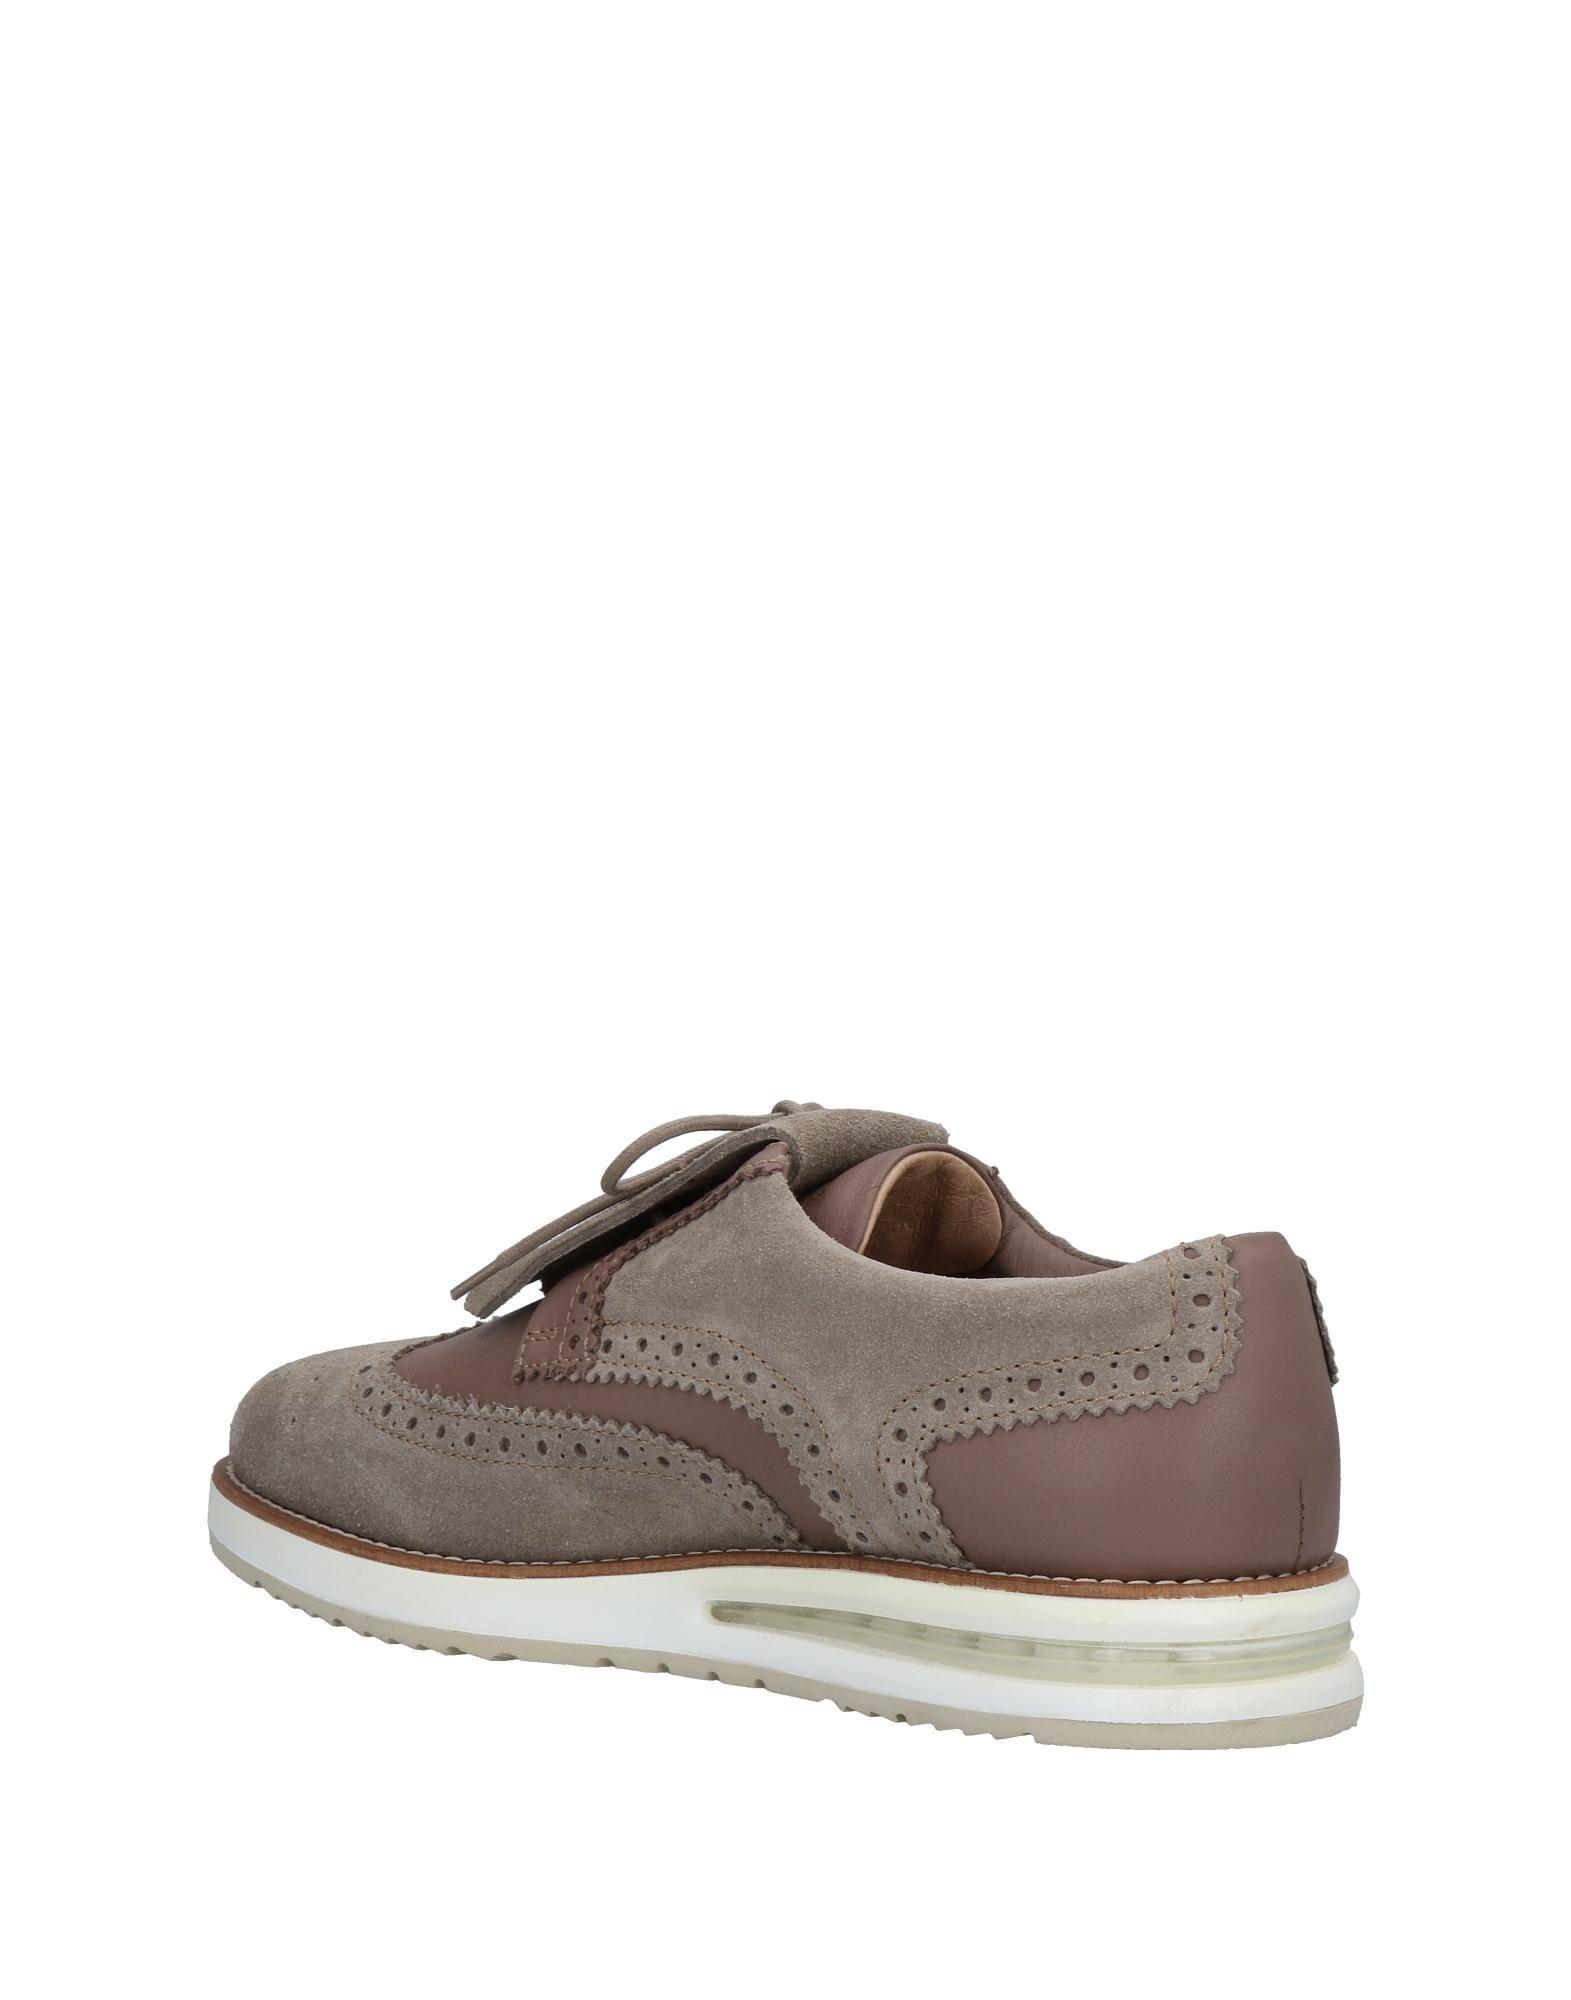 Rabatt echte Schuhe 11478816WV Barleycorn Mokassins Herren  11478816WV Schuhe 666813